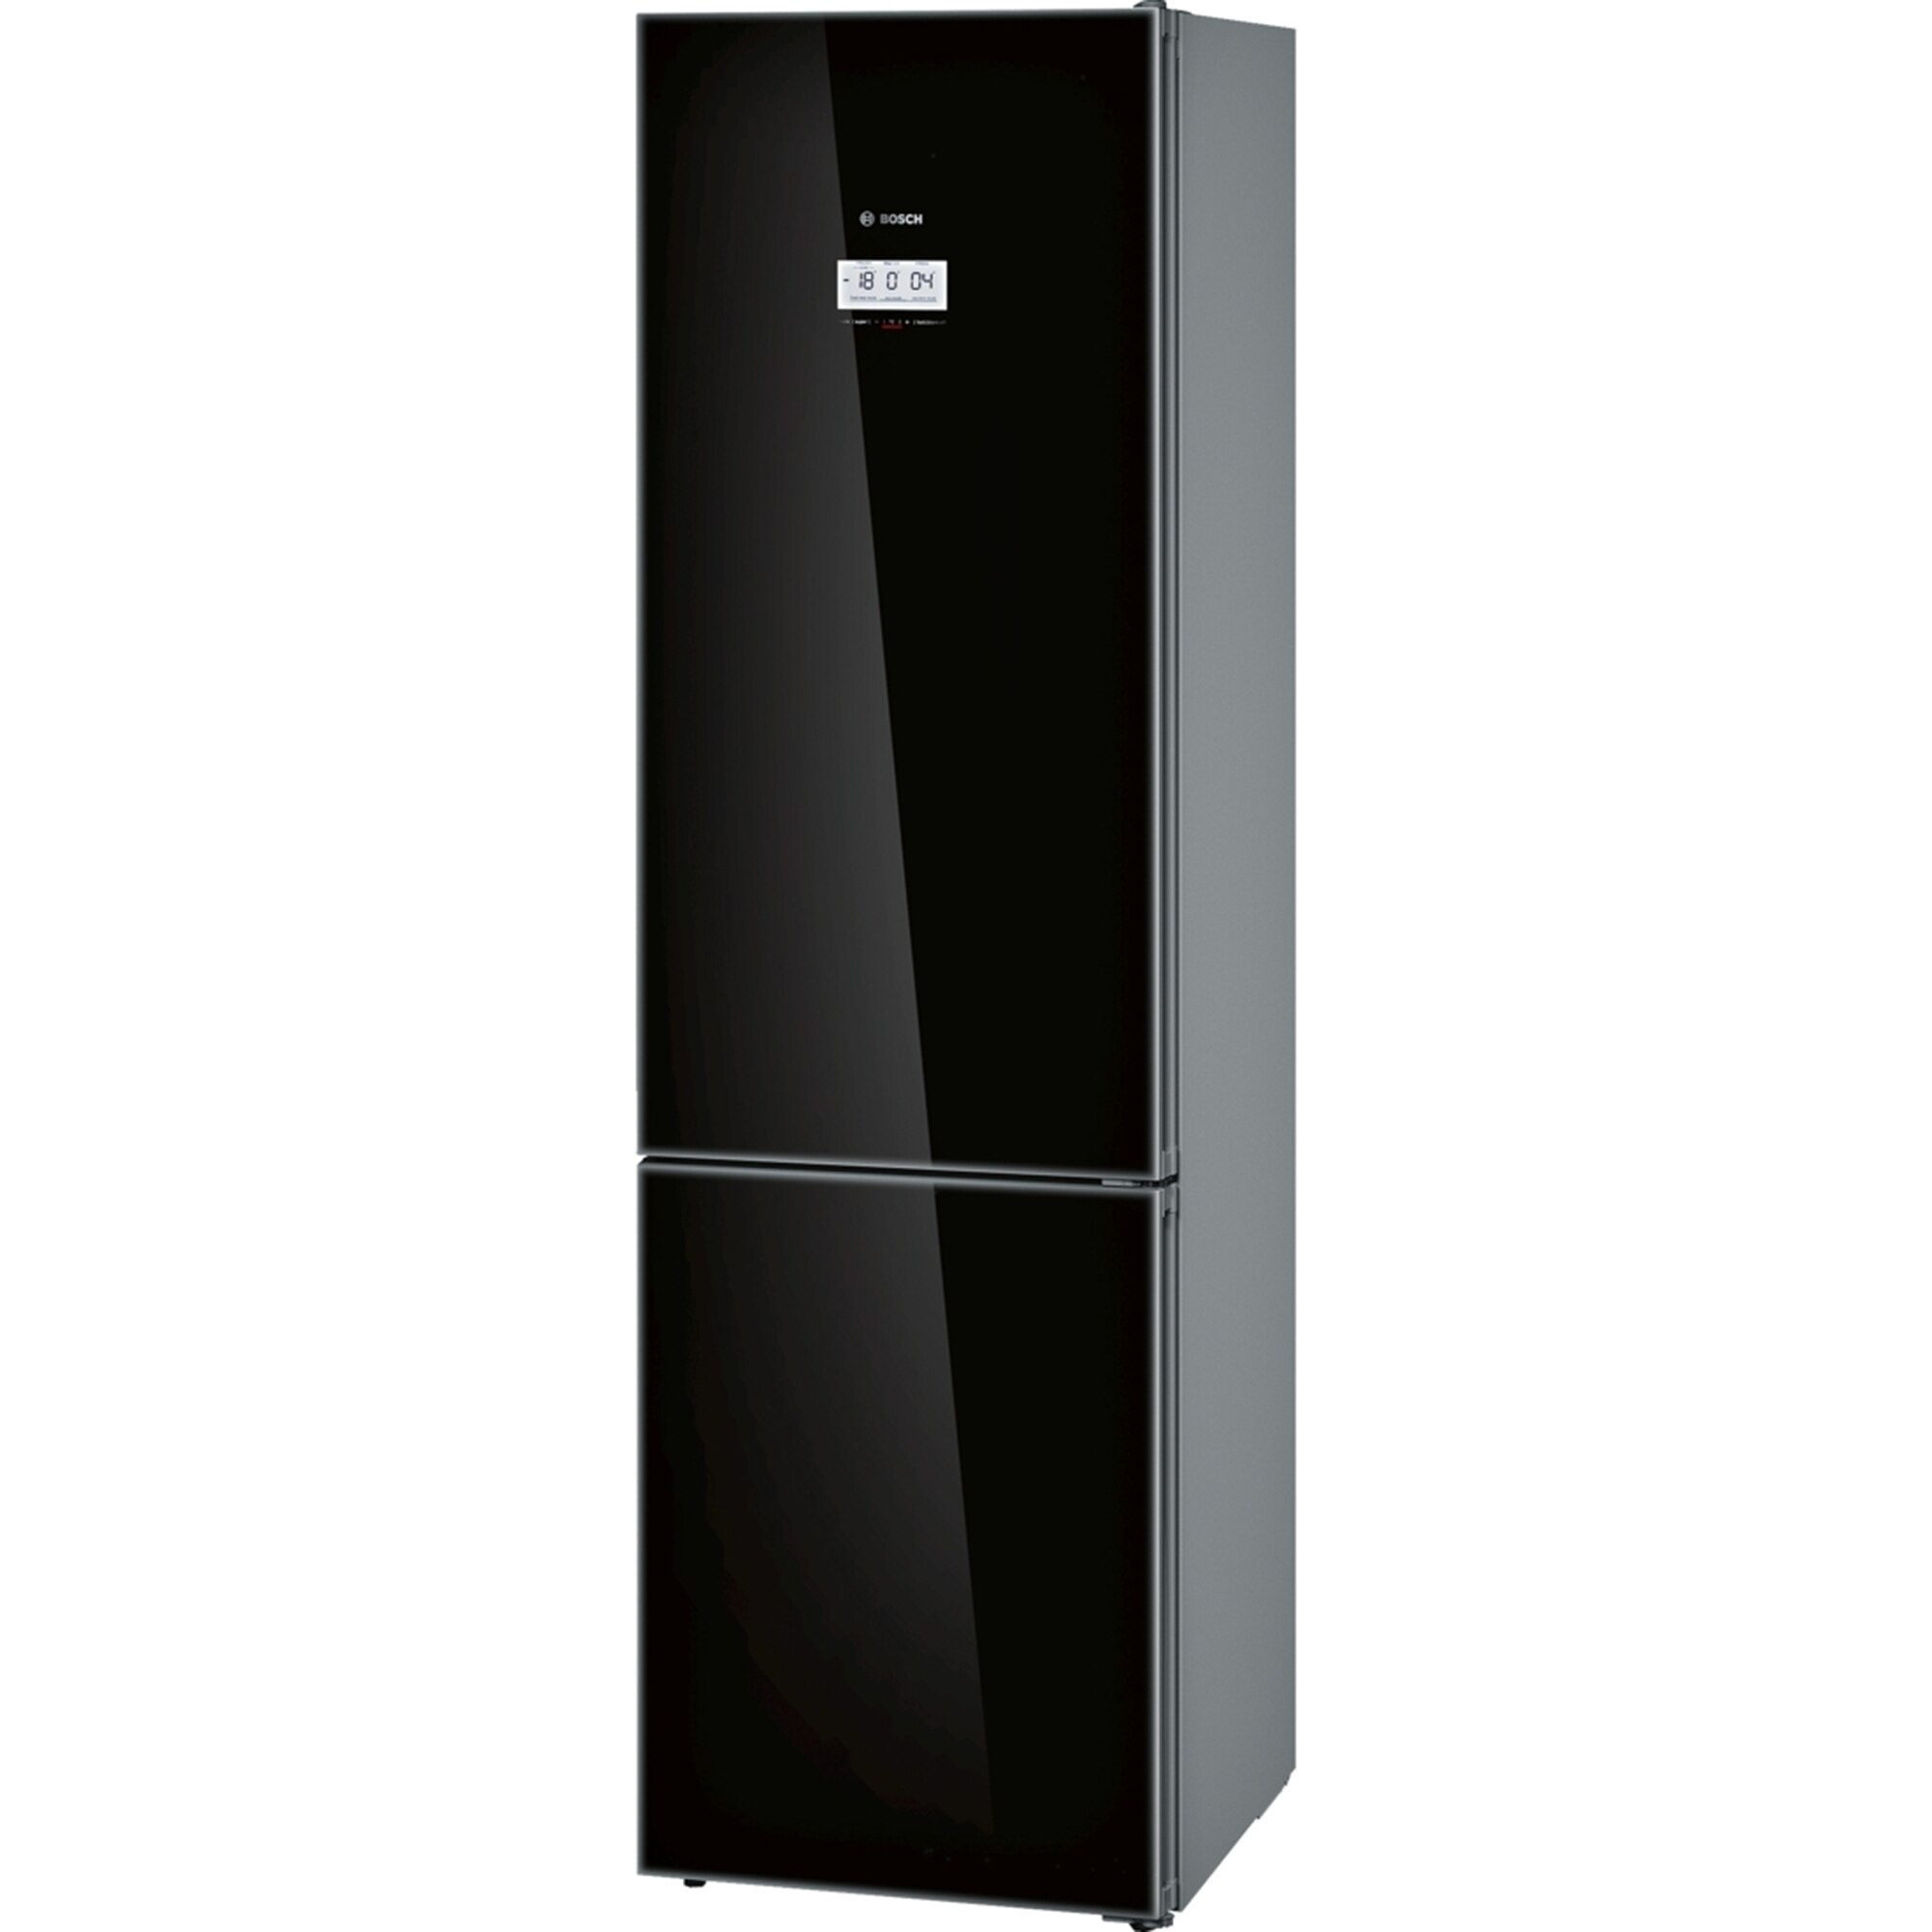 Fotografie Combina frigorifica Bosch KGF39SB45, 343 l, Clasa A+++, No Frost, VitaFresh Pro, Iluminare LED, WiFi Ready, TouchControl, H 203 cm, Negru